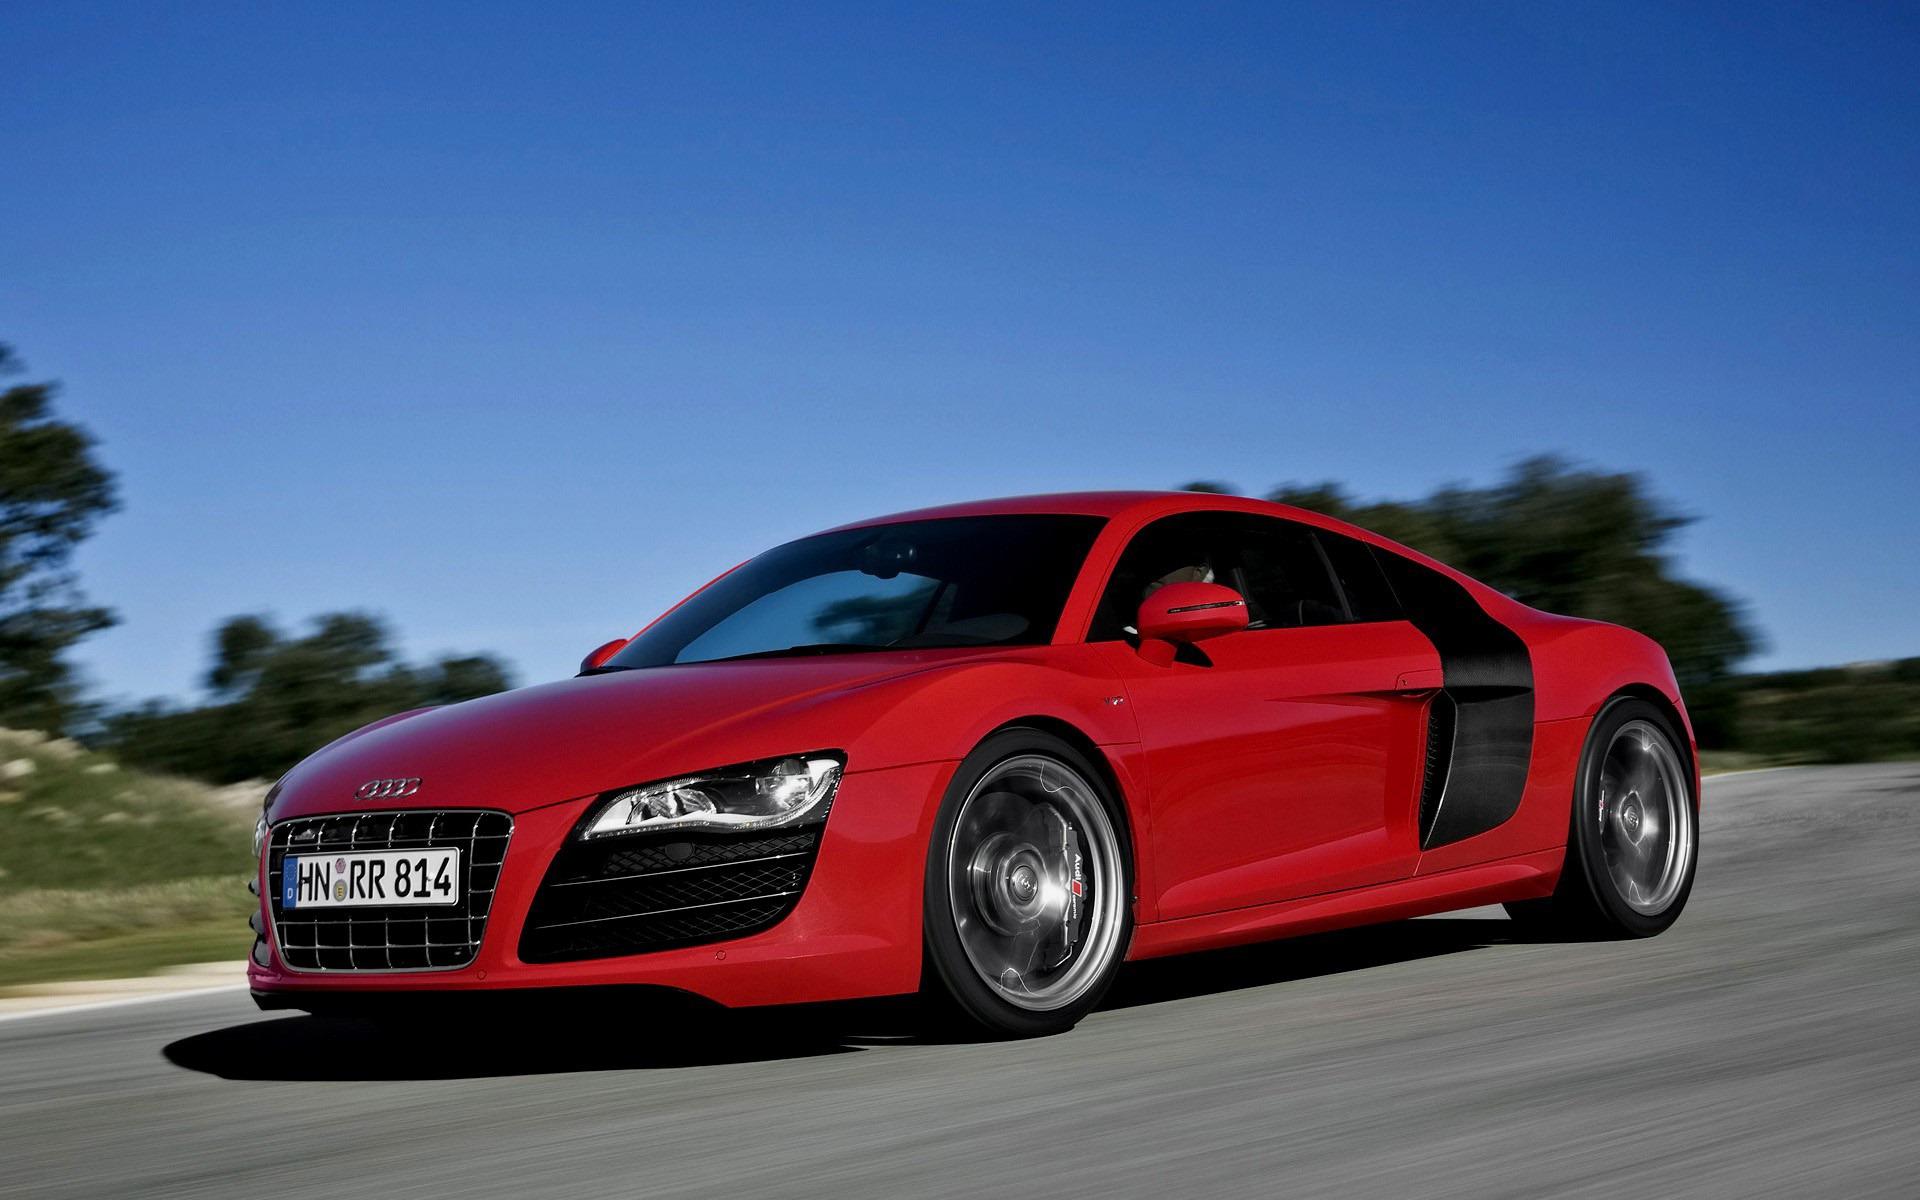 audi wallpapers download 119 Audi Wallpapers Download 1920x1200